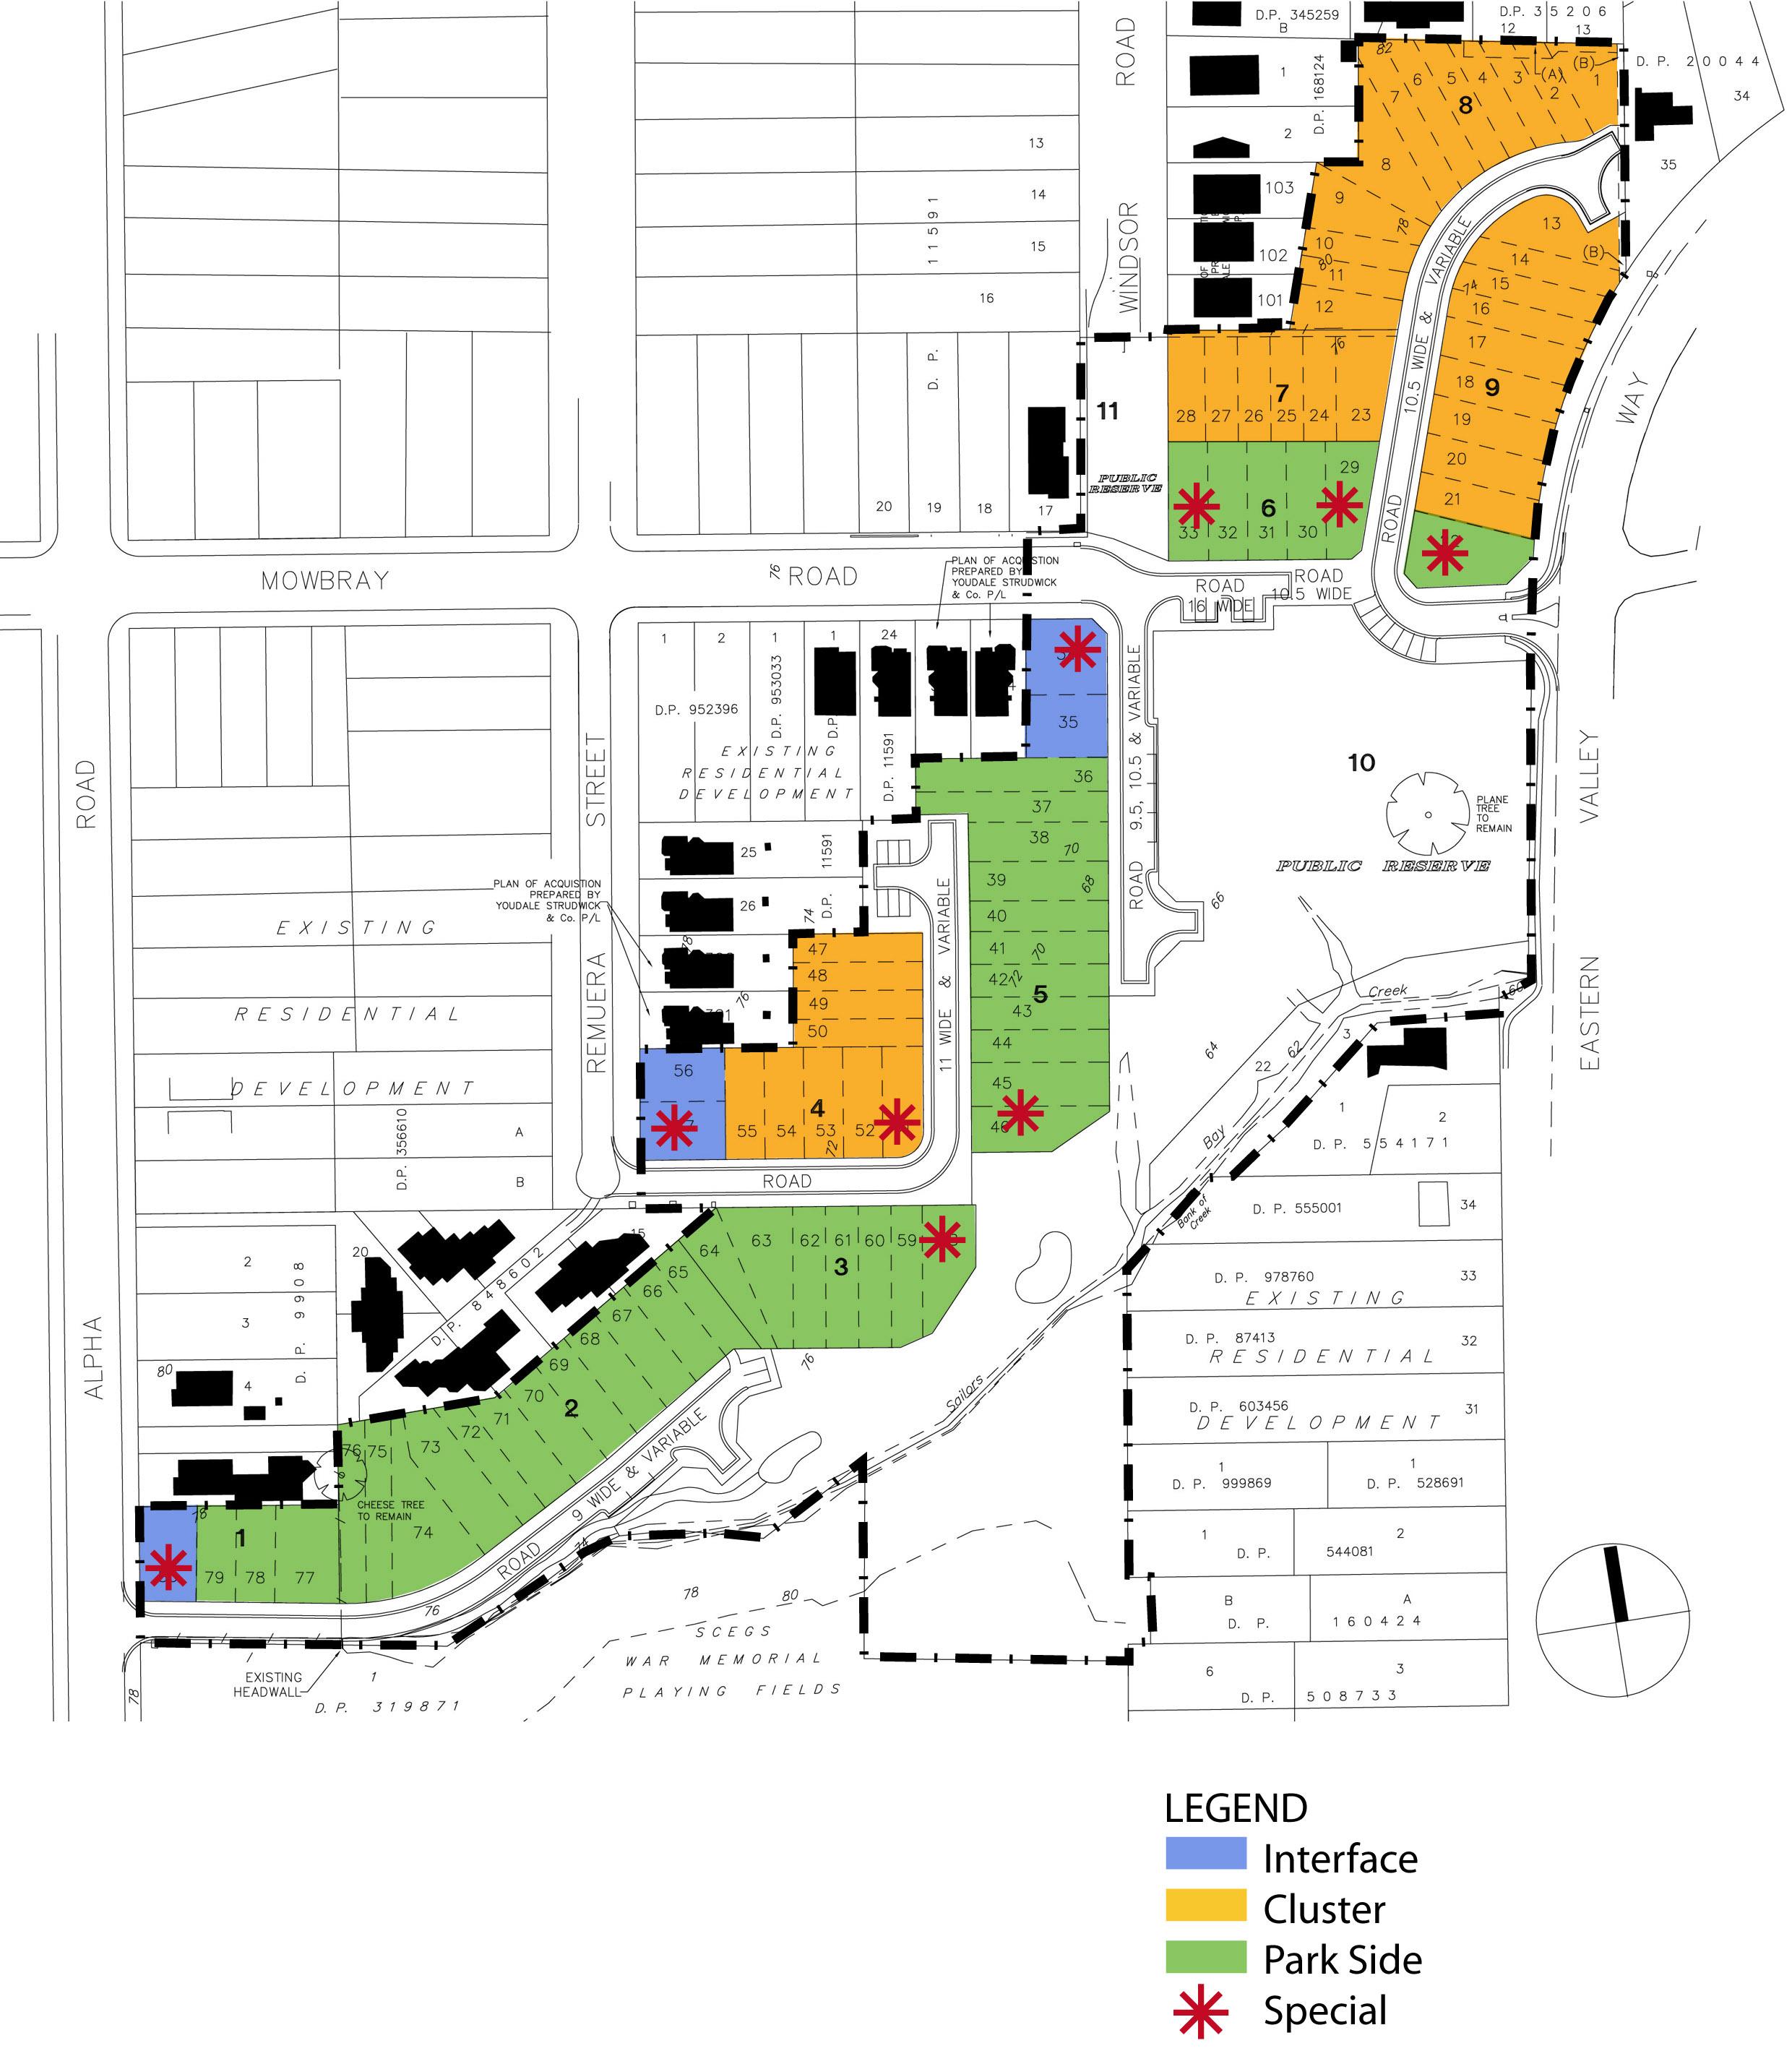 Willoughby_precinct plan.jpg